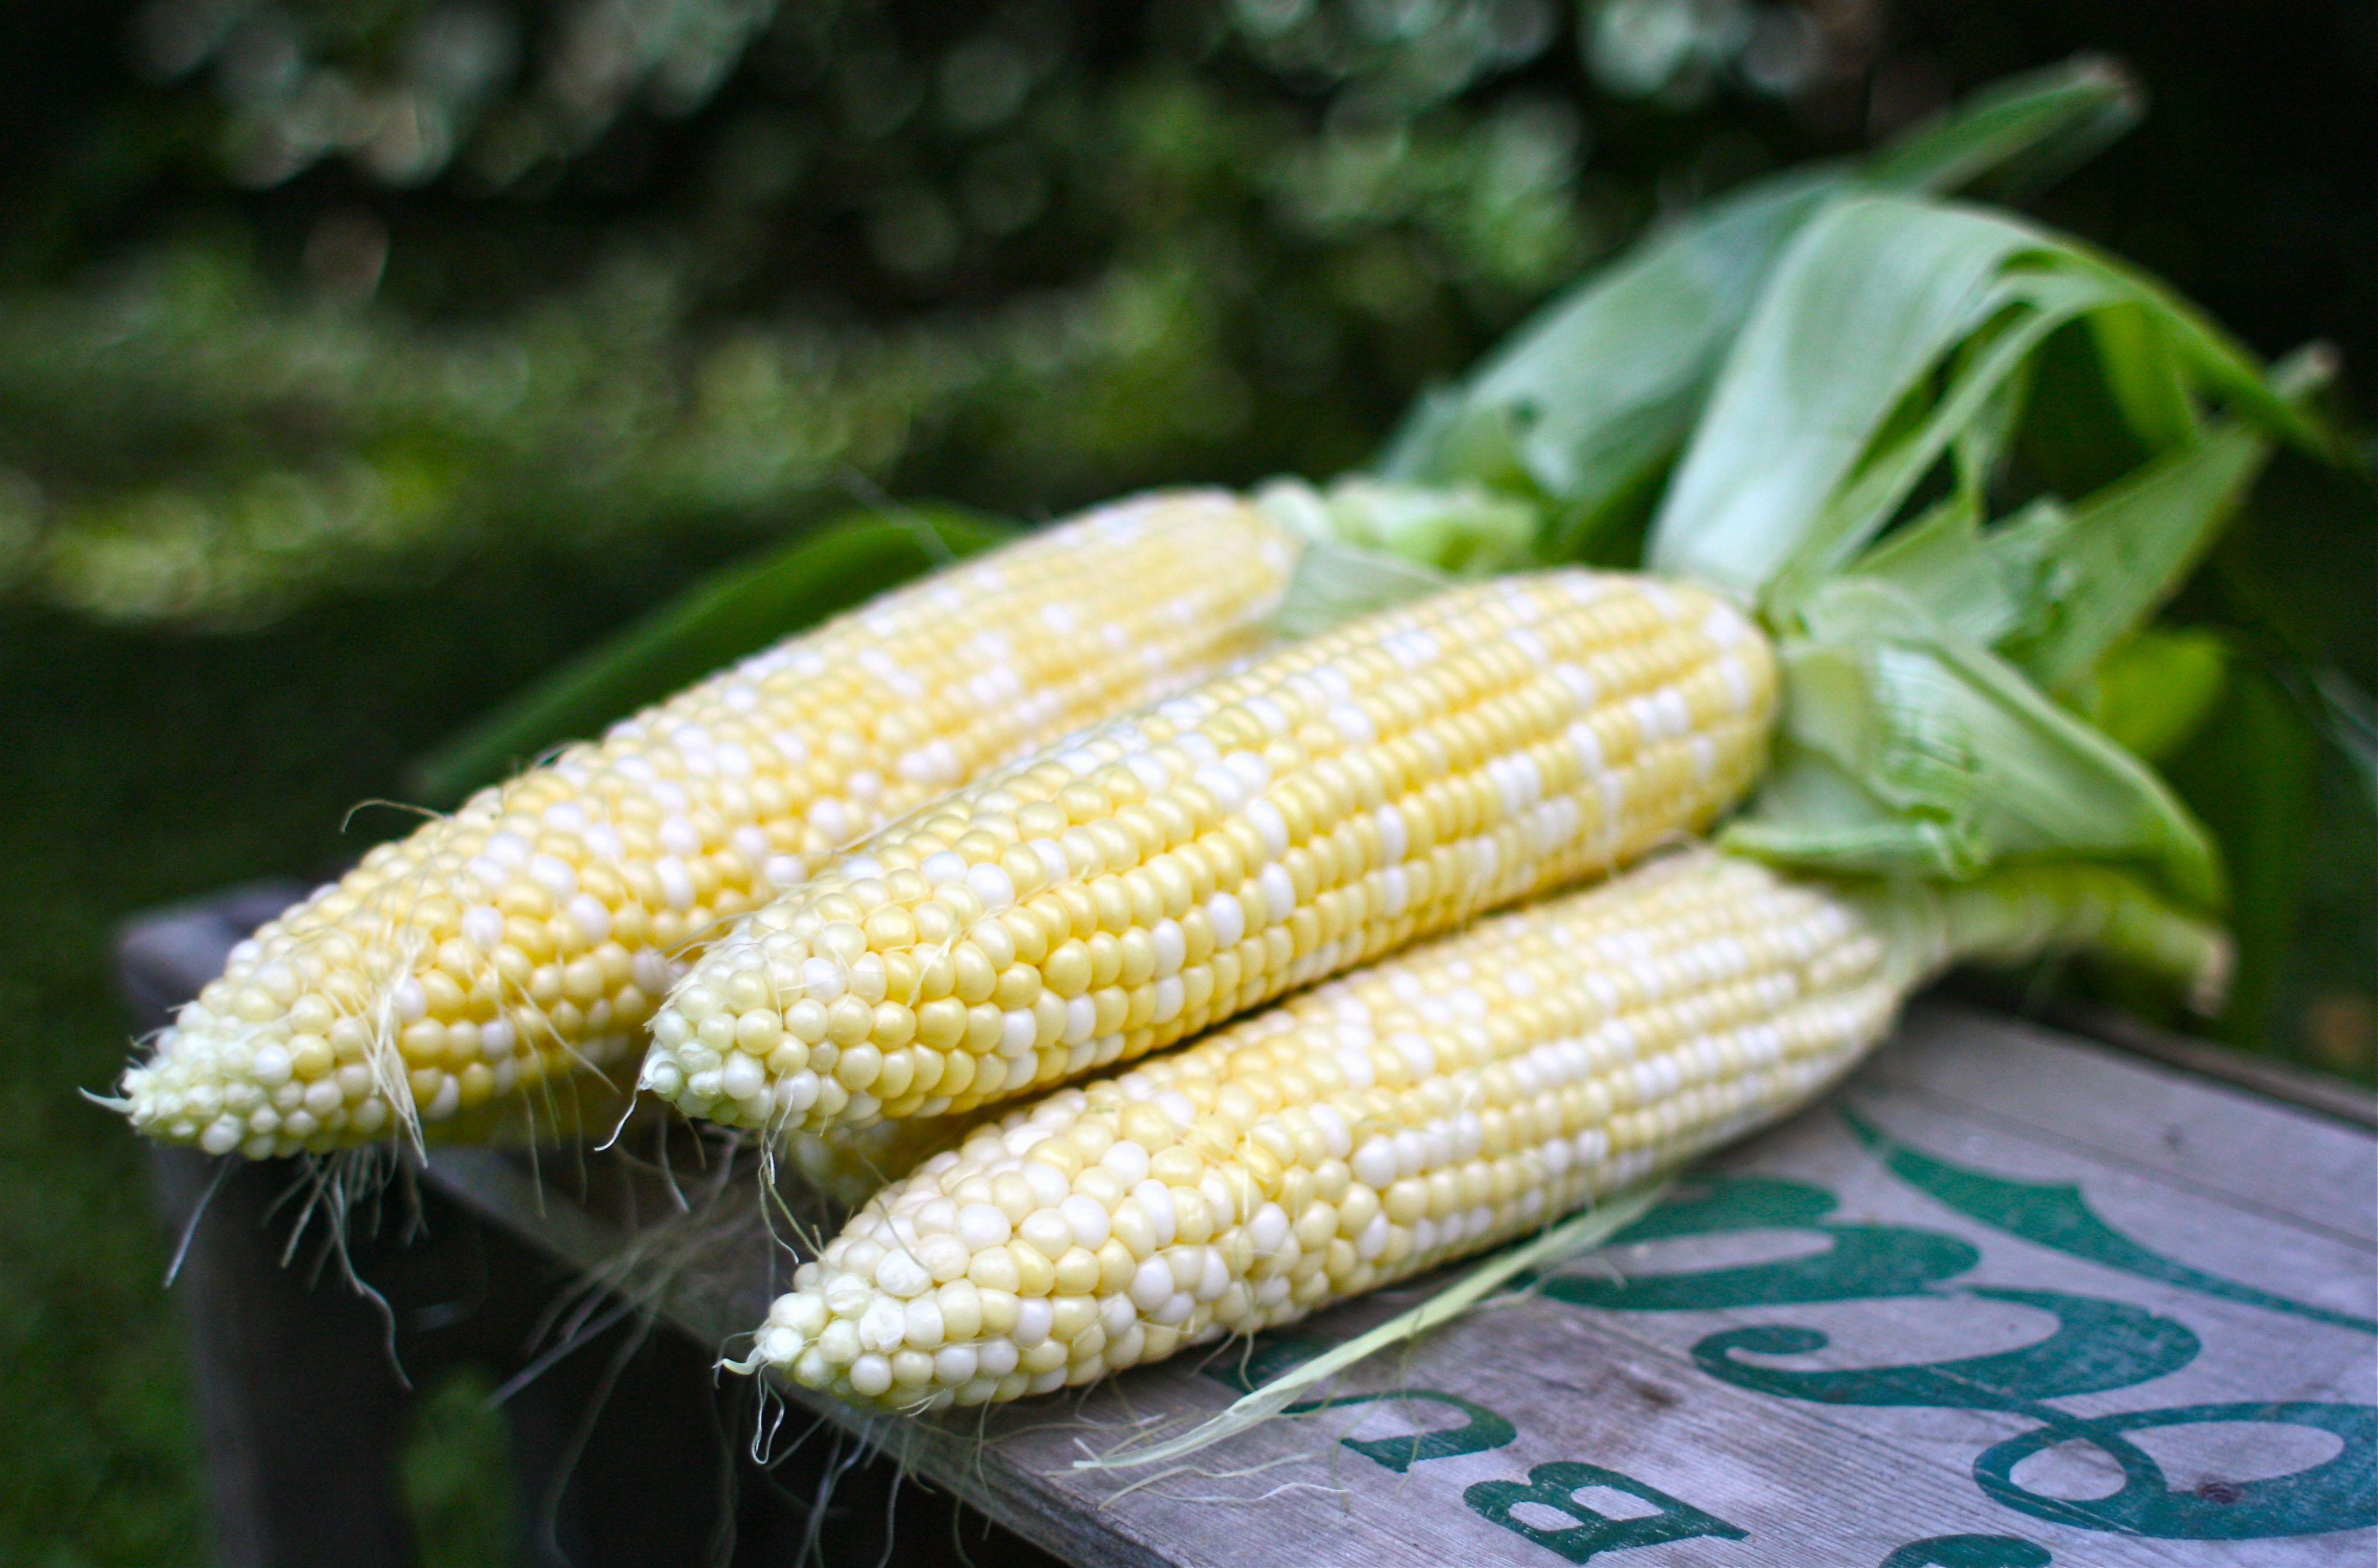 Spotlight Ingredient: Sweet Summer Corn | Simple Bites